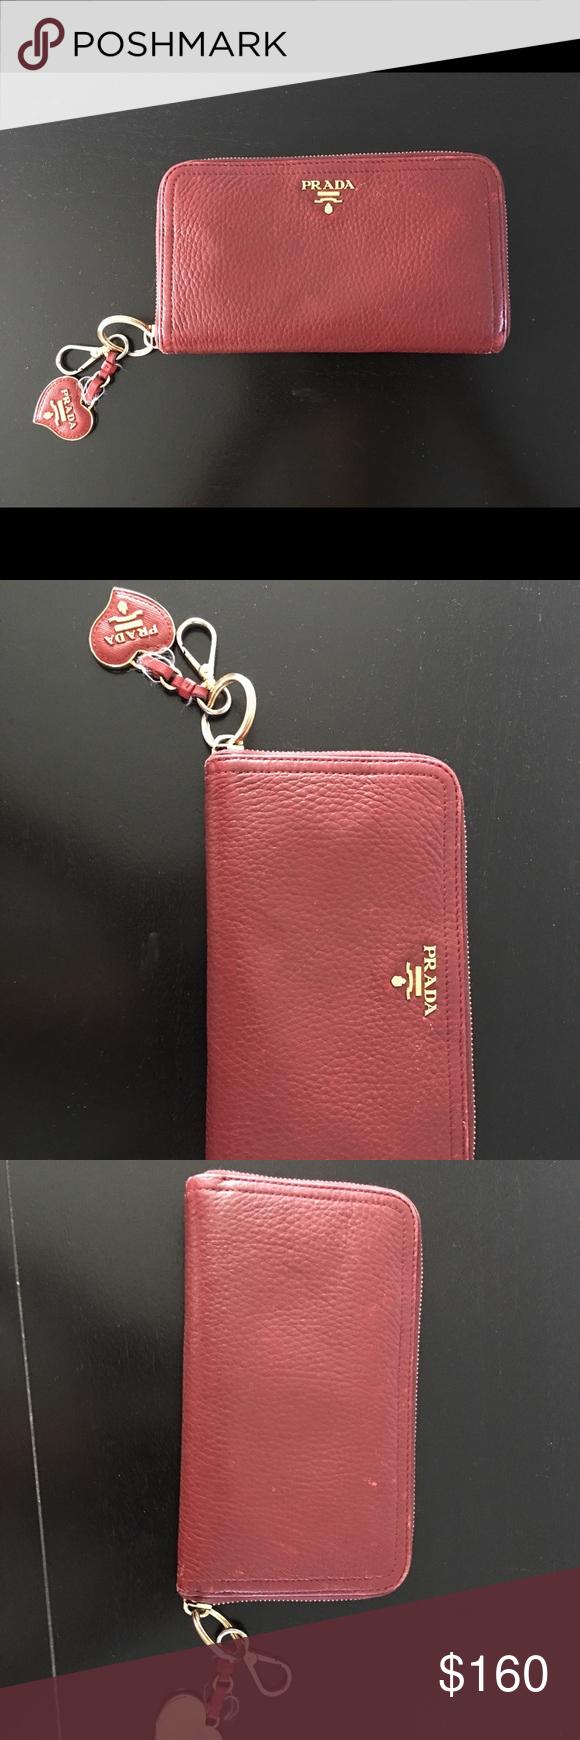 f67020525dd3 Prada Saffiano Metal Oro Wallet Keychain Fuoco Red Selling these Prada  wallet with a matching Prada